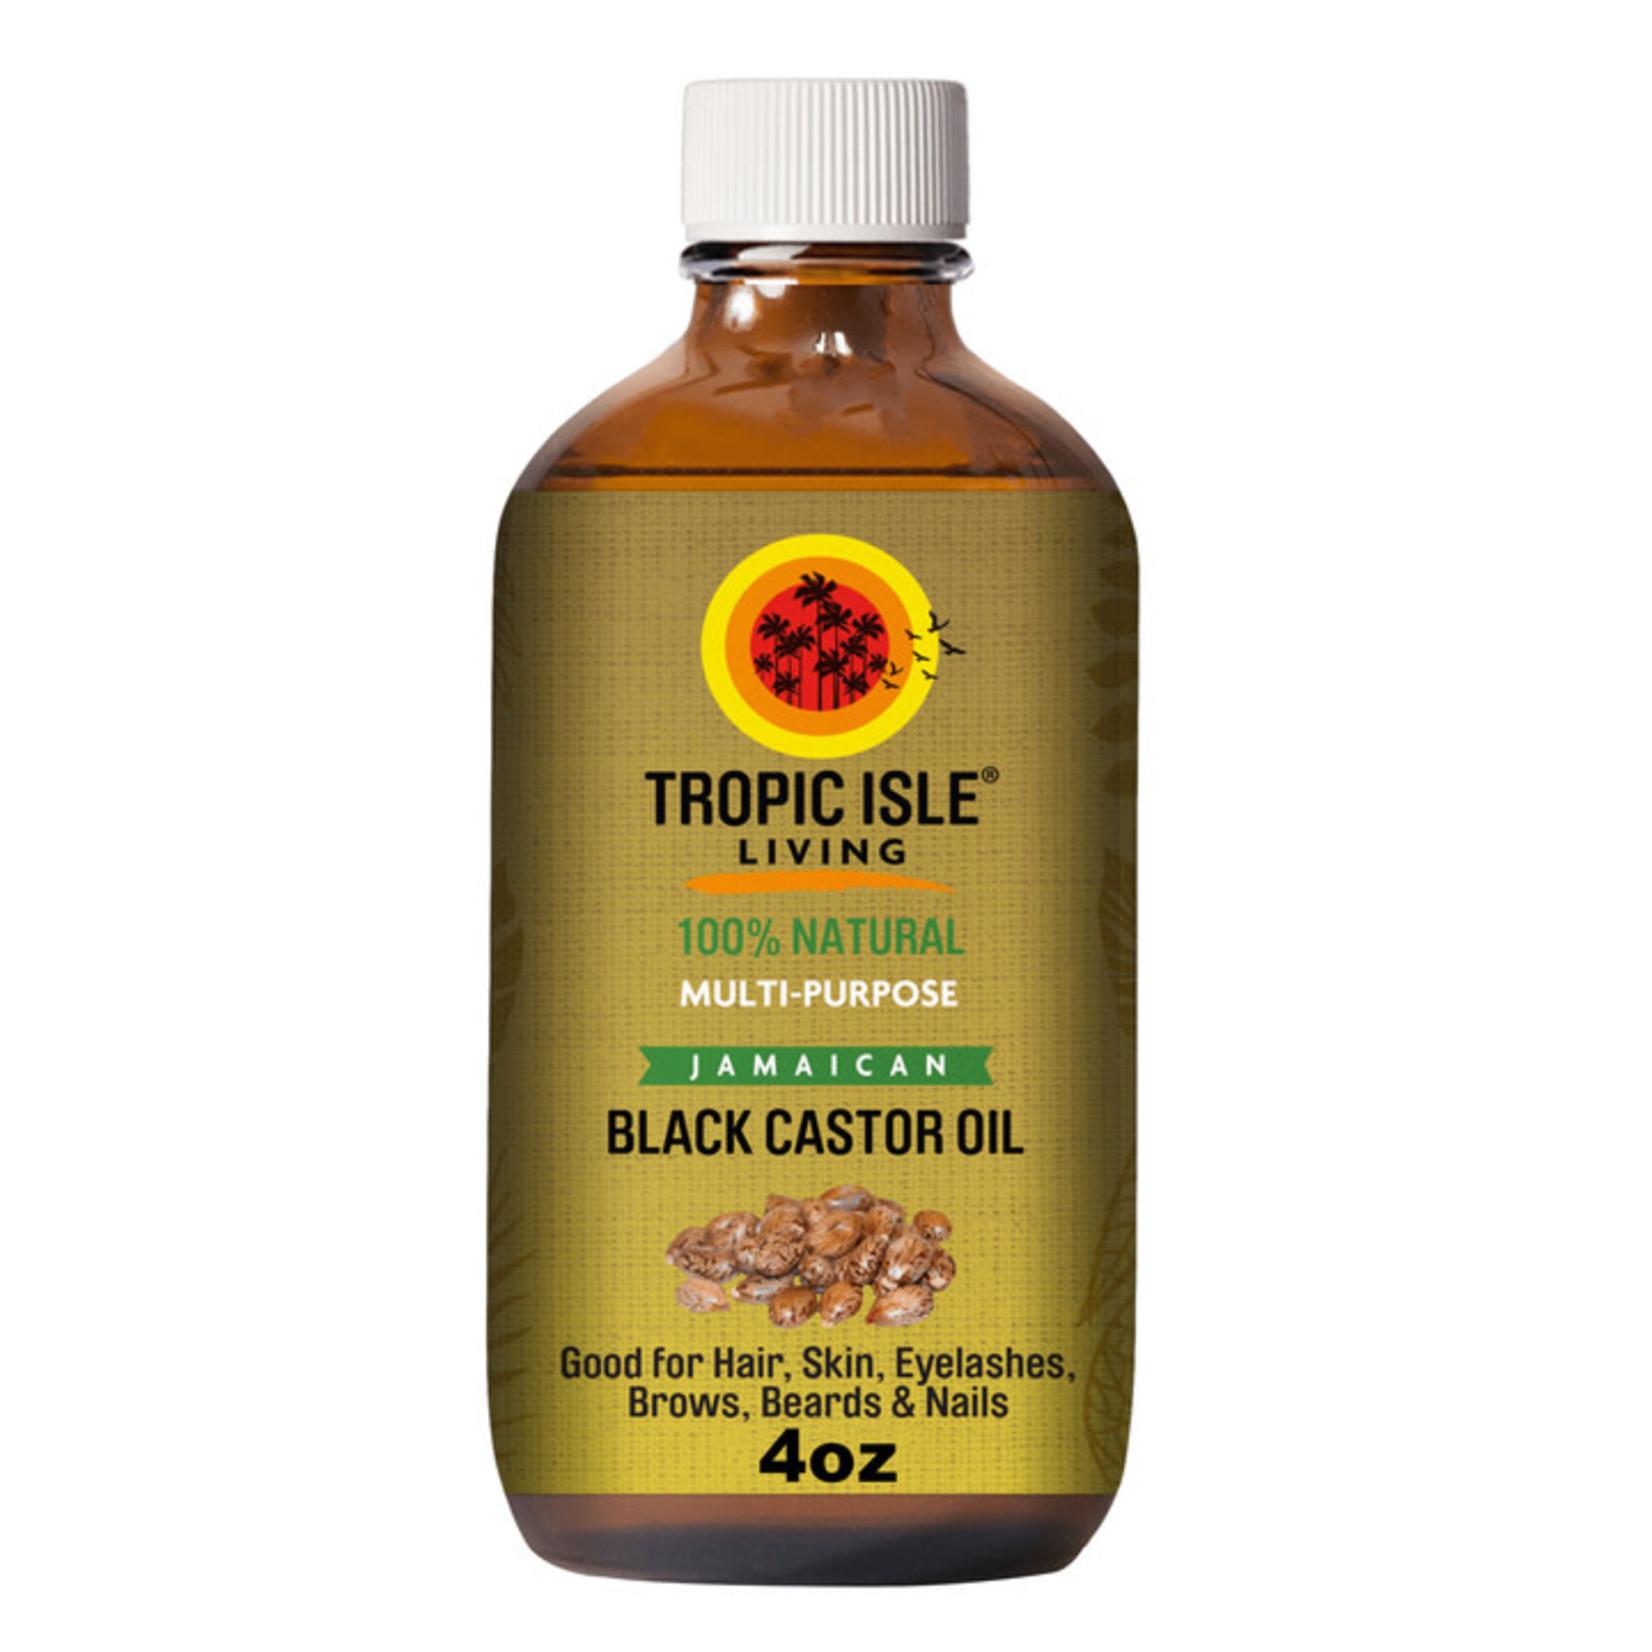 TROPIC ISLE TROPIC ISLE LIVING BLACK CASTOR OIL - ORIGINAL [4OZ]